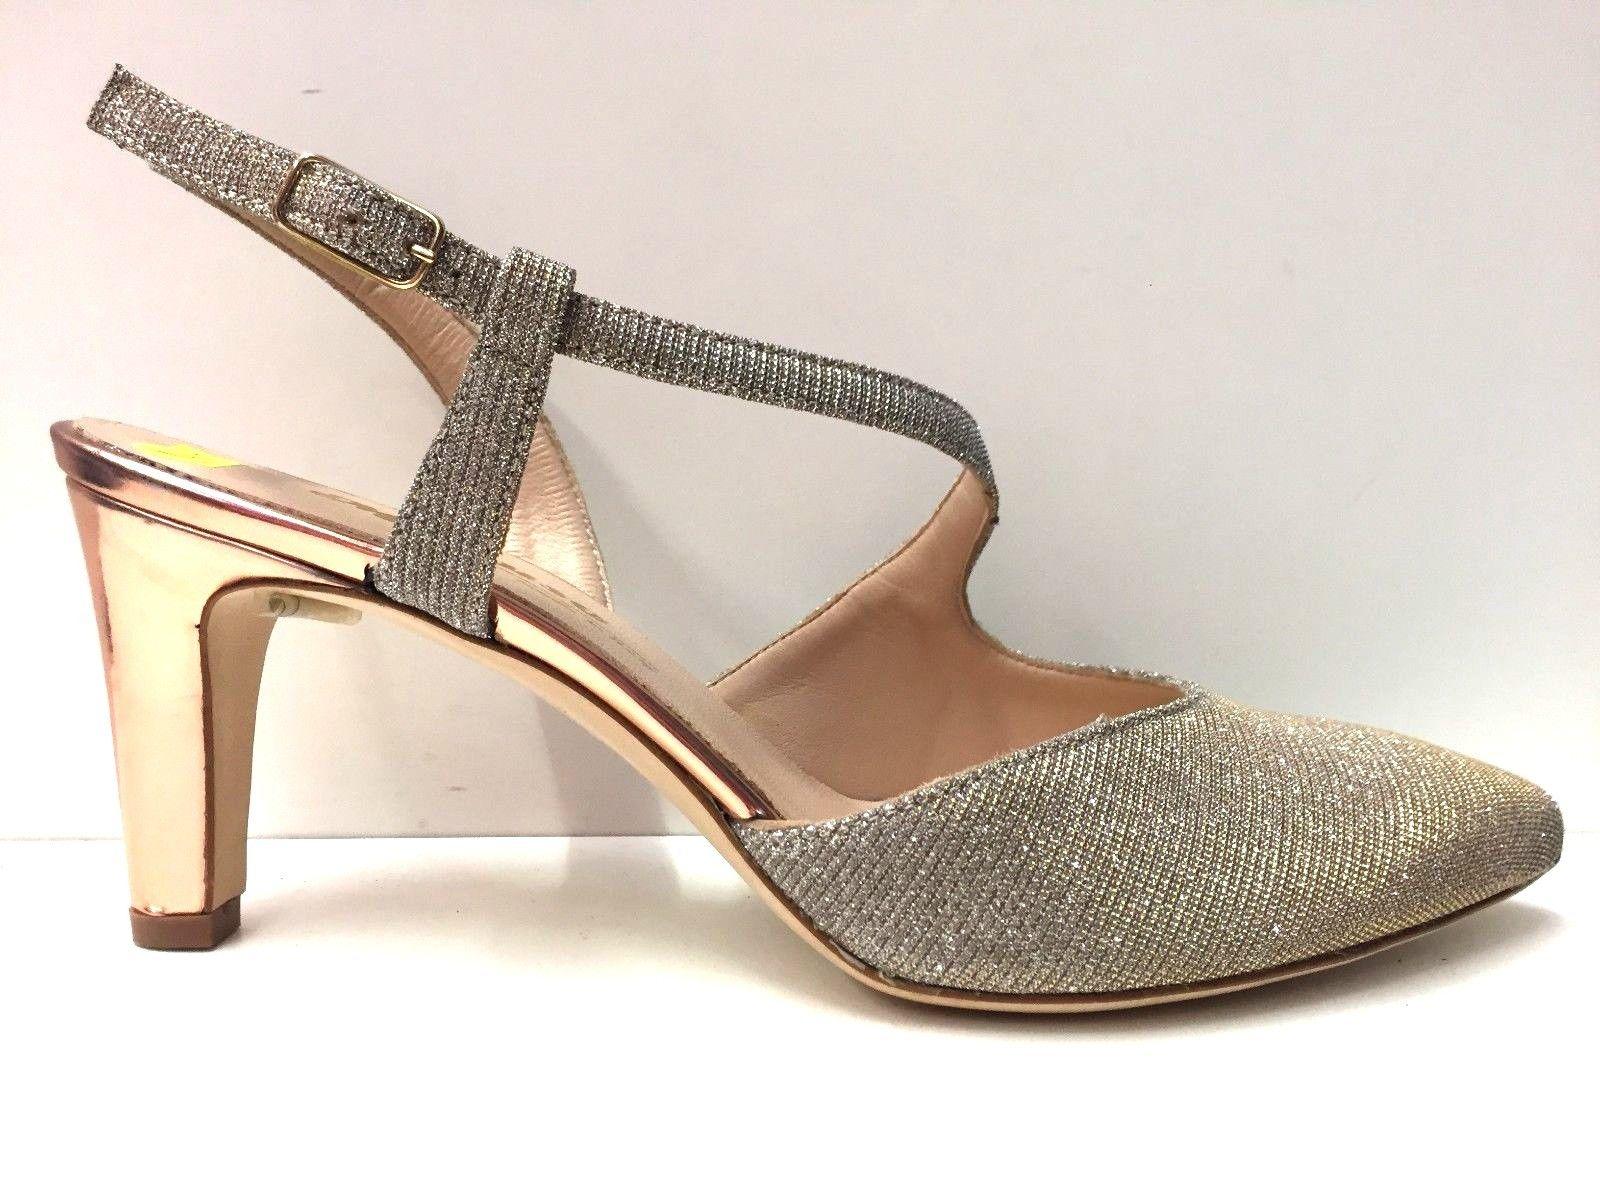 Acquisti Shoppissimo Di Line Shopping On Web…24h Yf7byi6vg vwnO8mN0